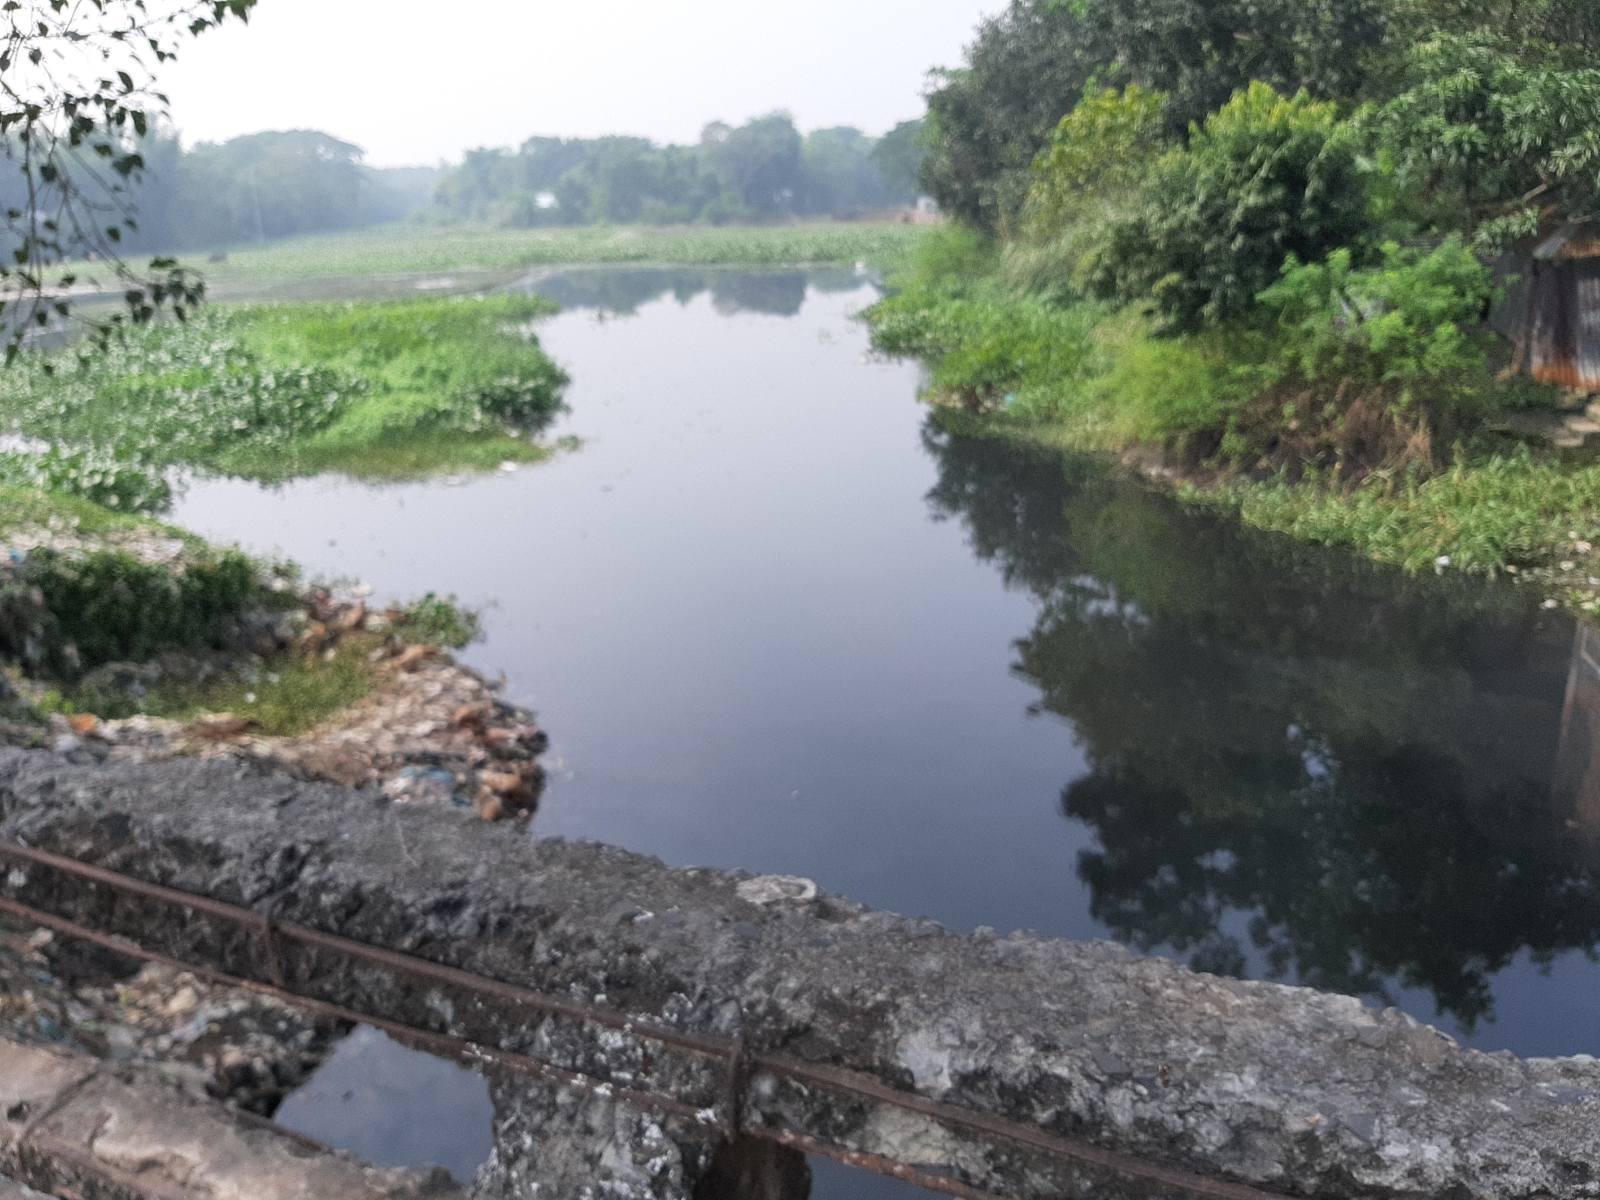 Ichamati-River-Pabna-Bangladesh-as-of-November-2020-1.jpg